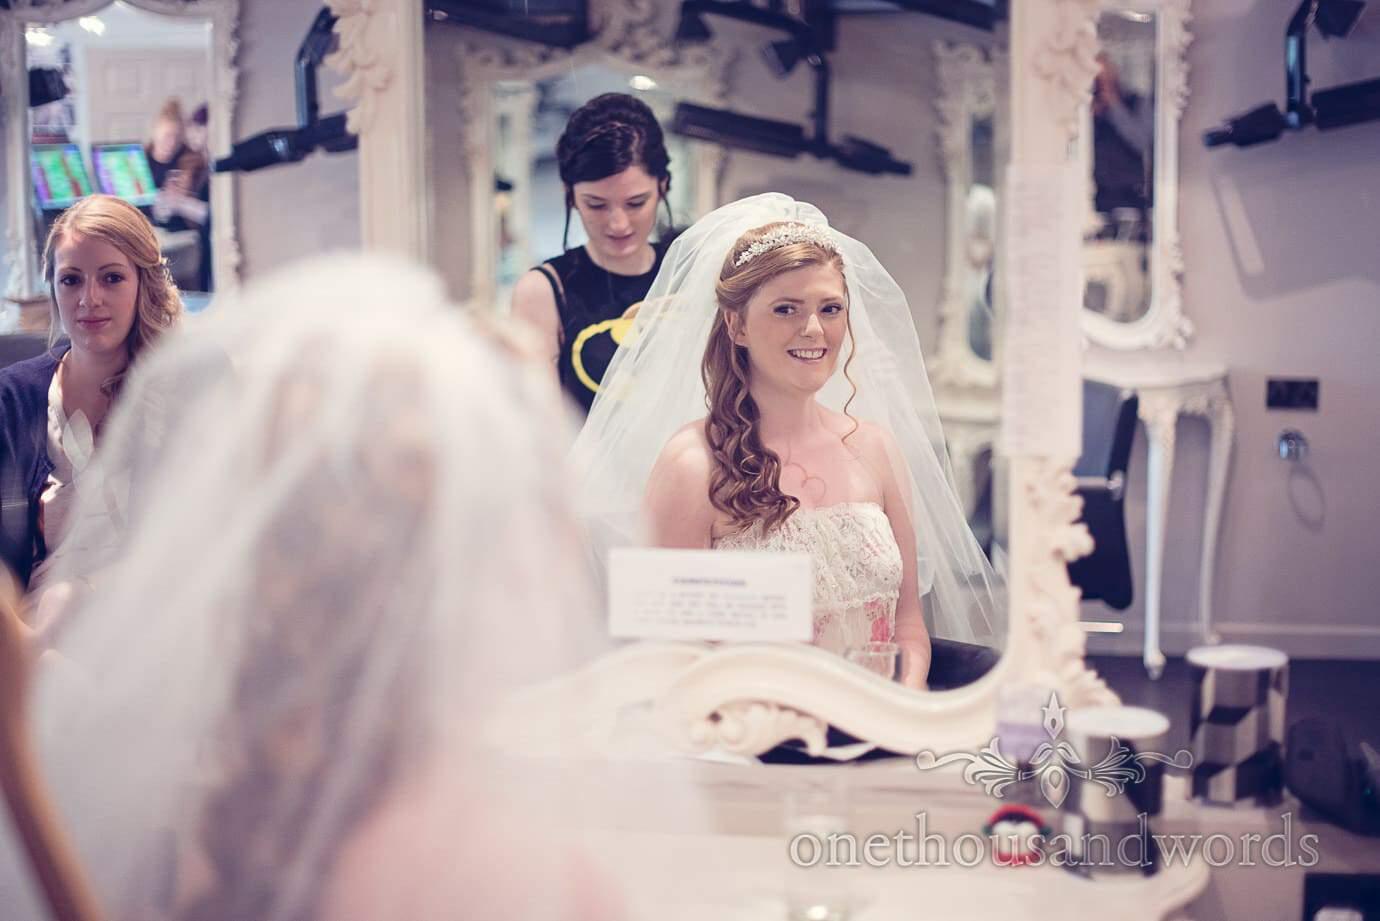 Bride wears veil in hairdressers mirror on wedding morning